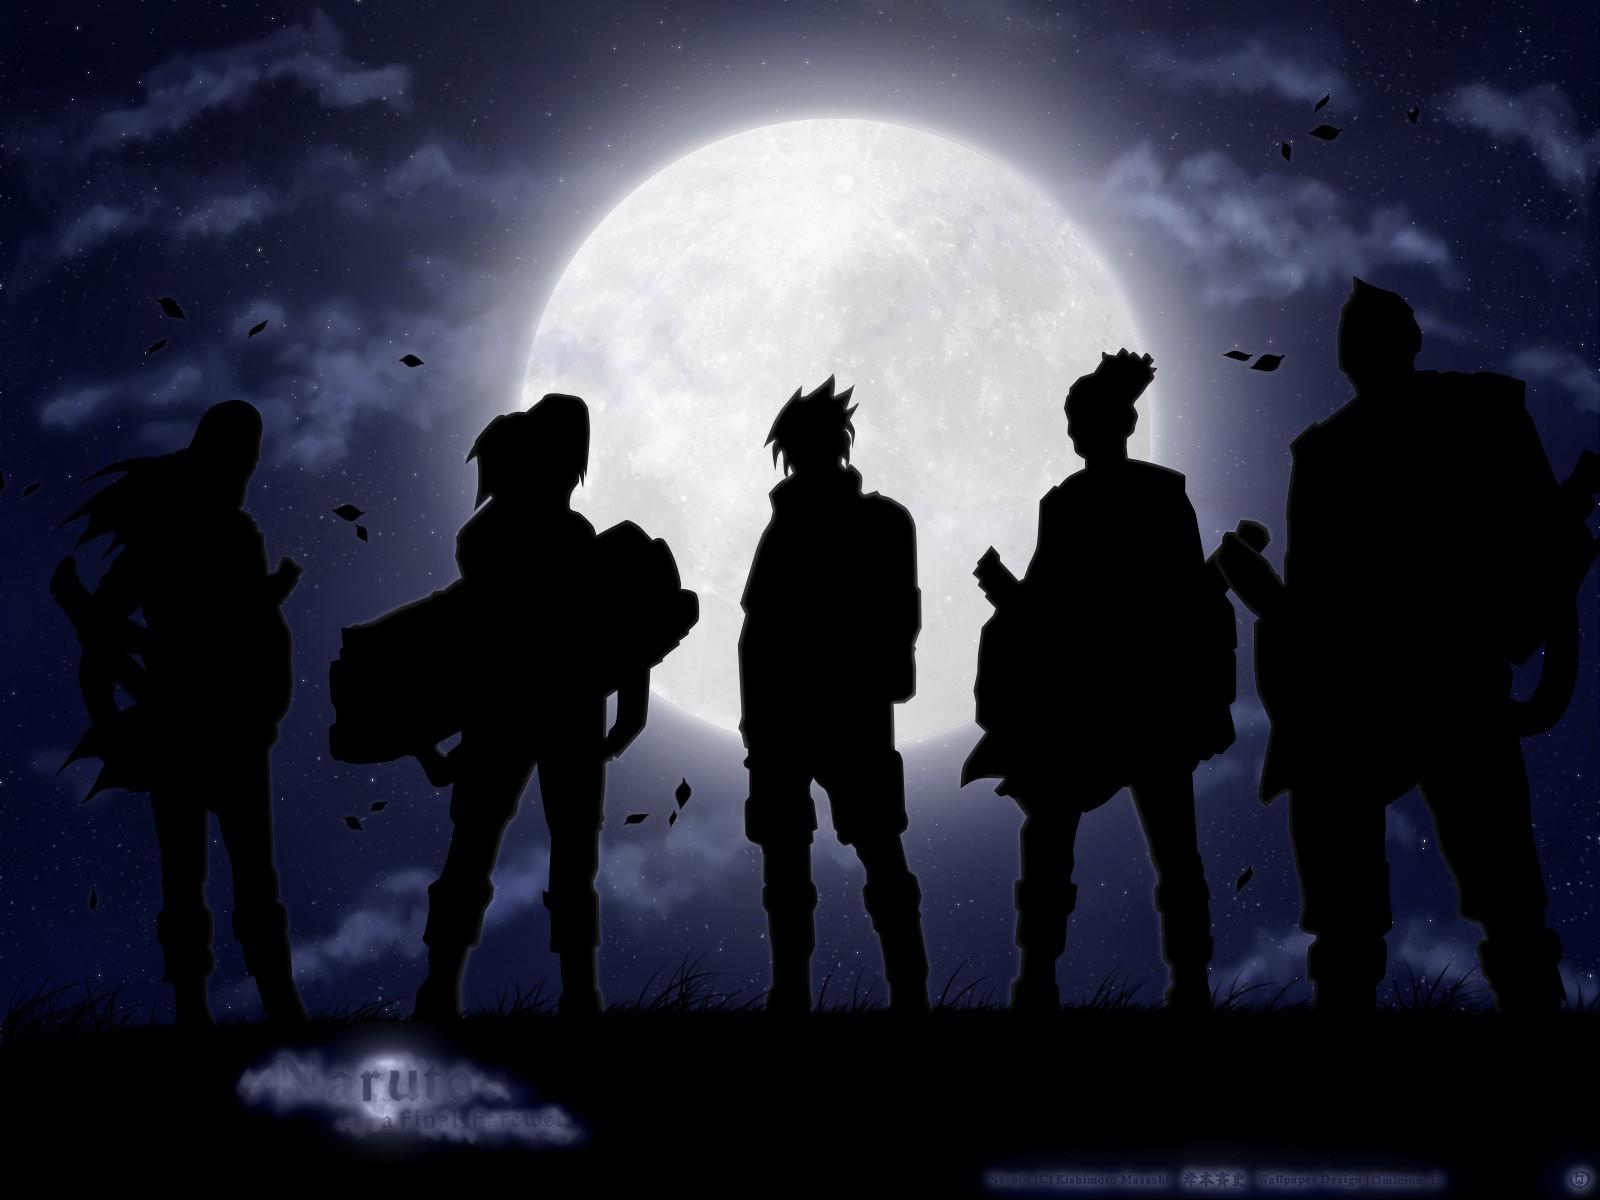 Anime Naruto Wallpaper Hd Naruto Images Sasuke Hd Wallpaper And Background Photos